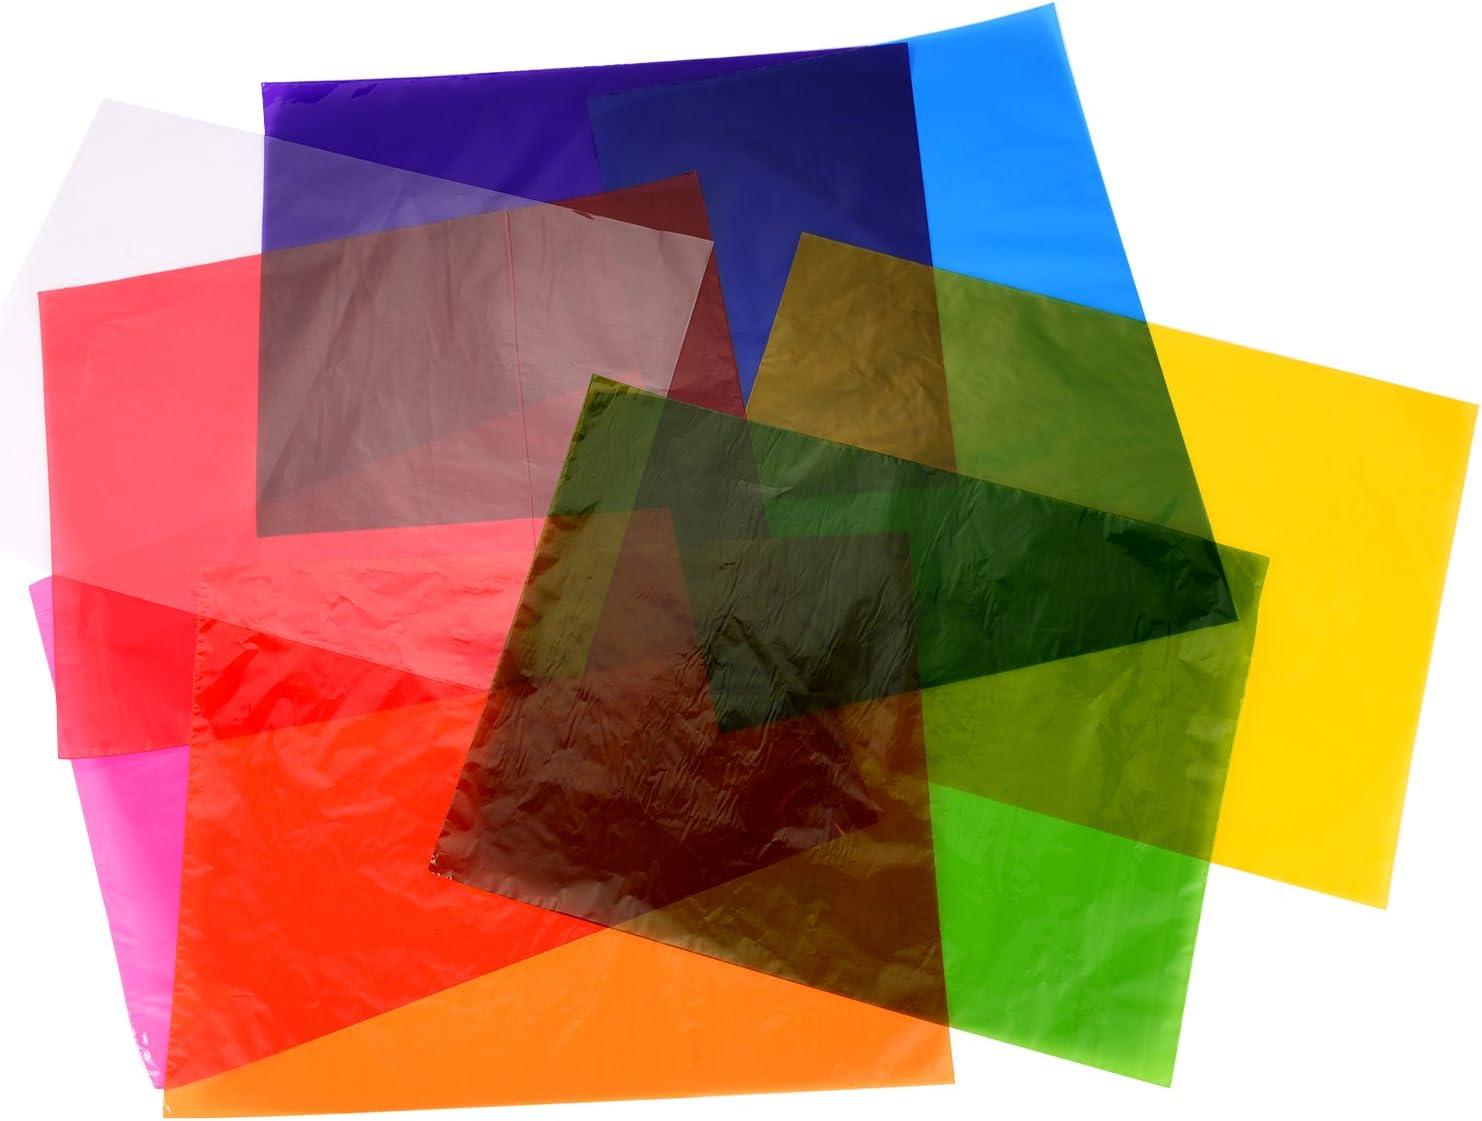 Outus Cellophane Wraps Cellophane Sheets Cello Sheets 11.8 by 8.5 Inch, 8 Colors, 104 Pieces: Home & Kitchen